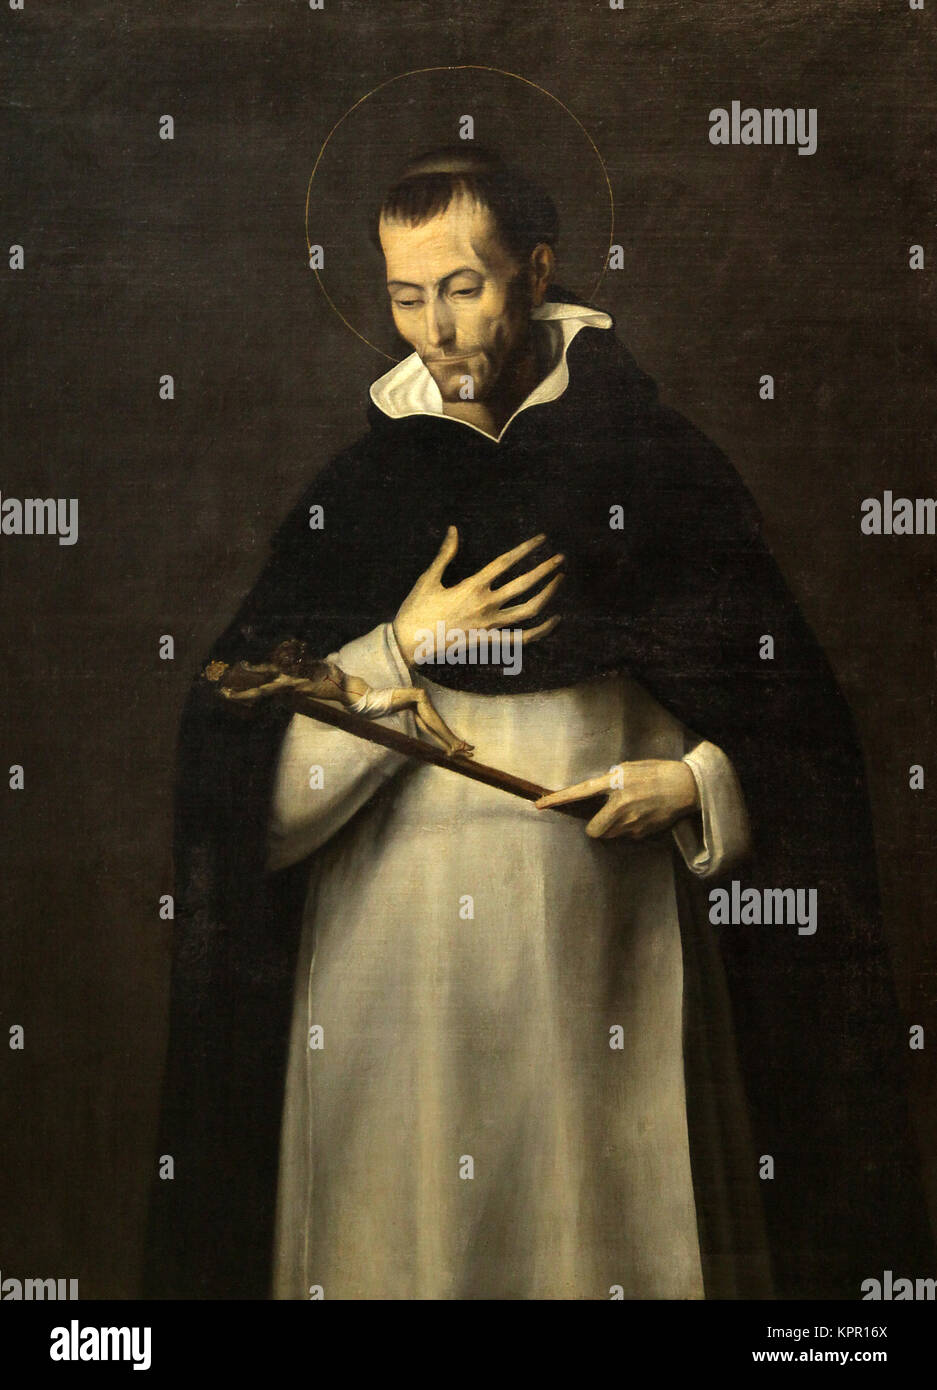 the Venerable Louis Bertrand 1584 by Juan Sariñena 1545-1619 spanish painter - Stock Image